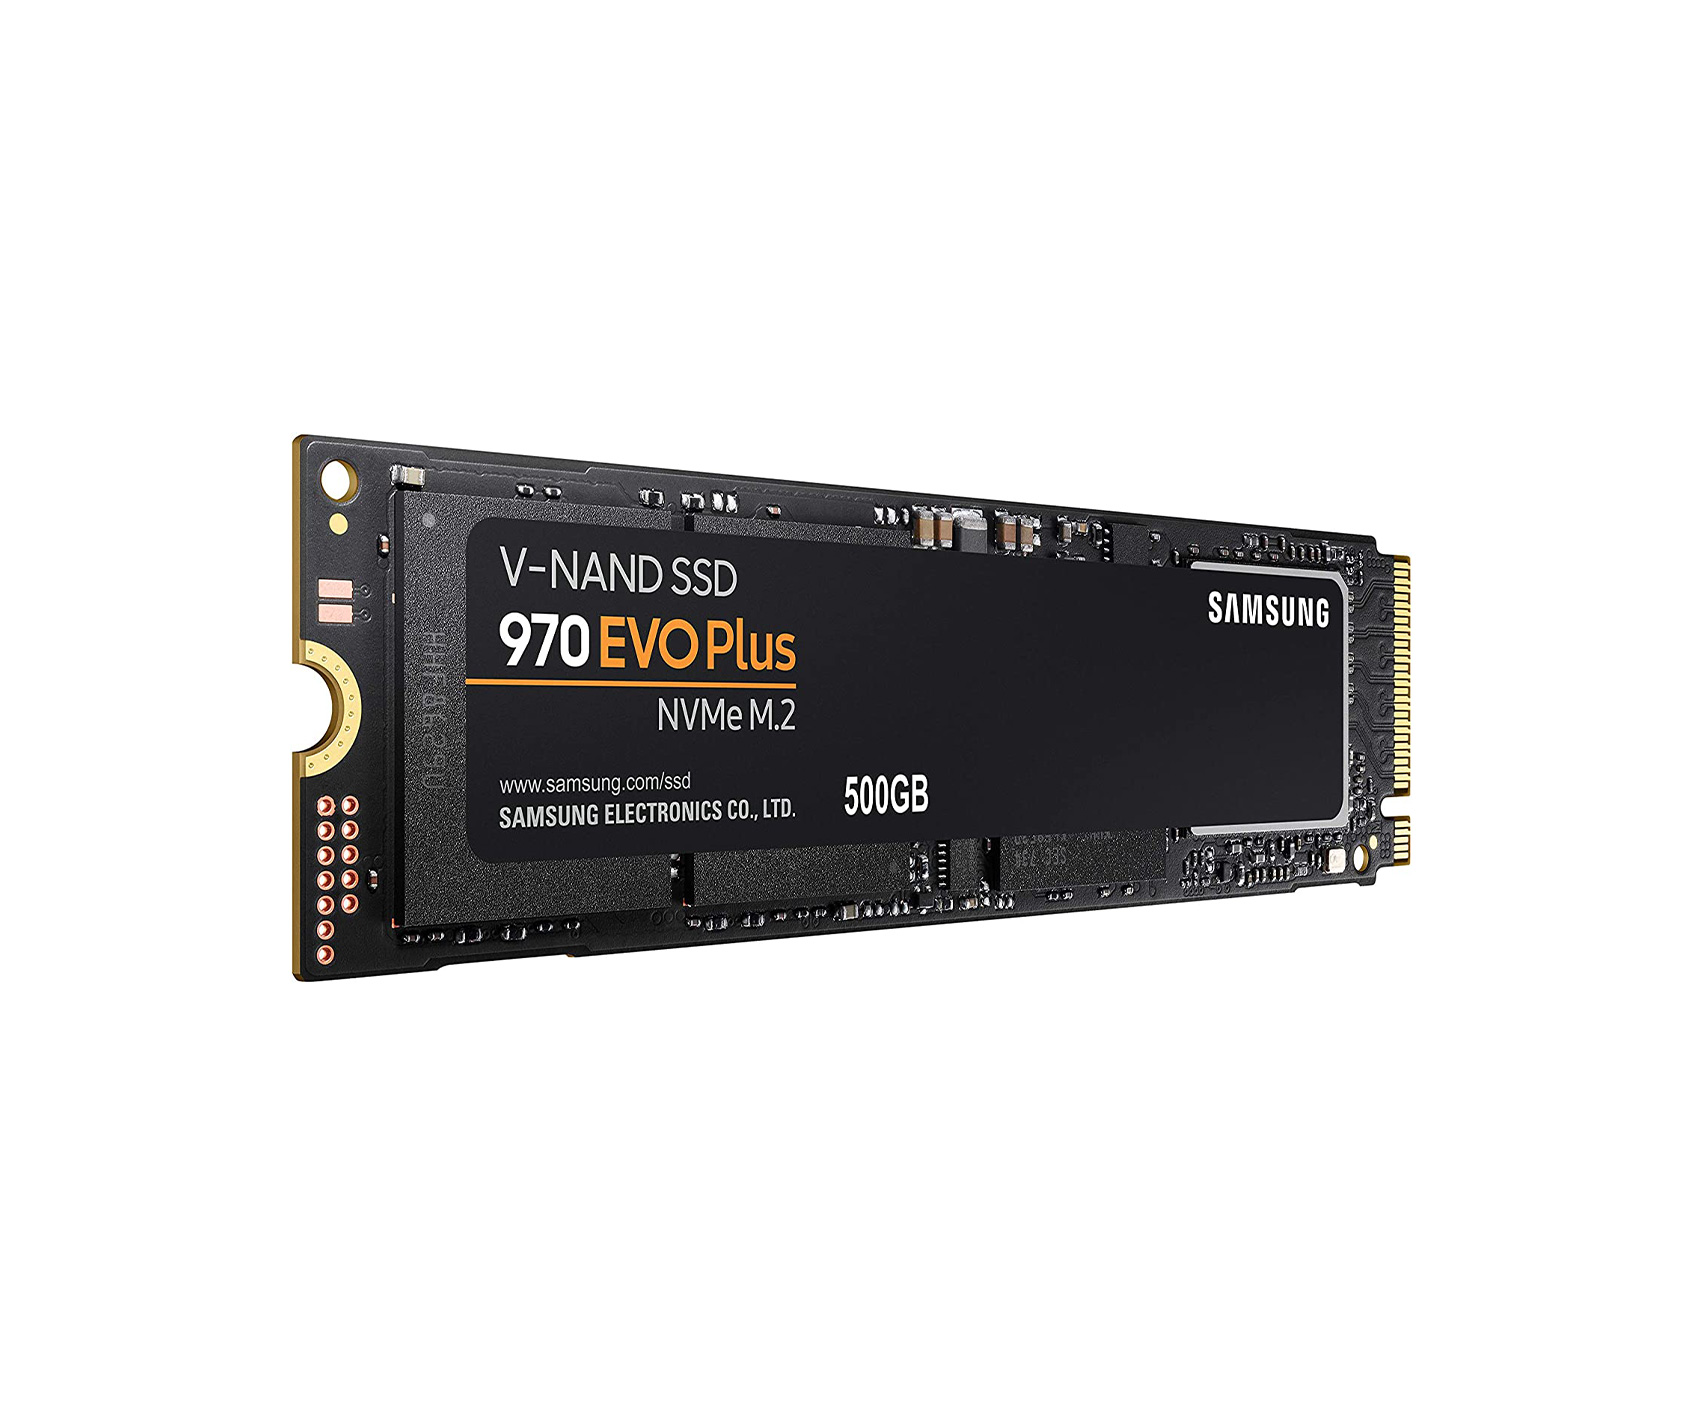 Samsung Evo Plus 970 NVMe 500GB SSD